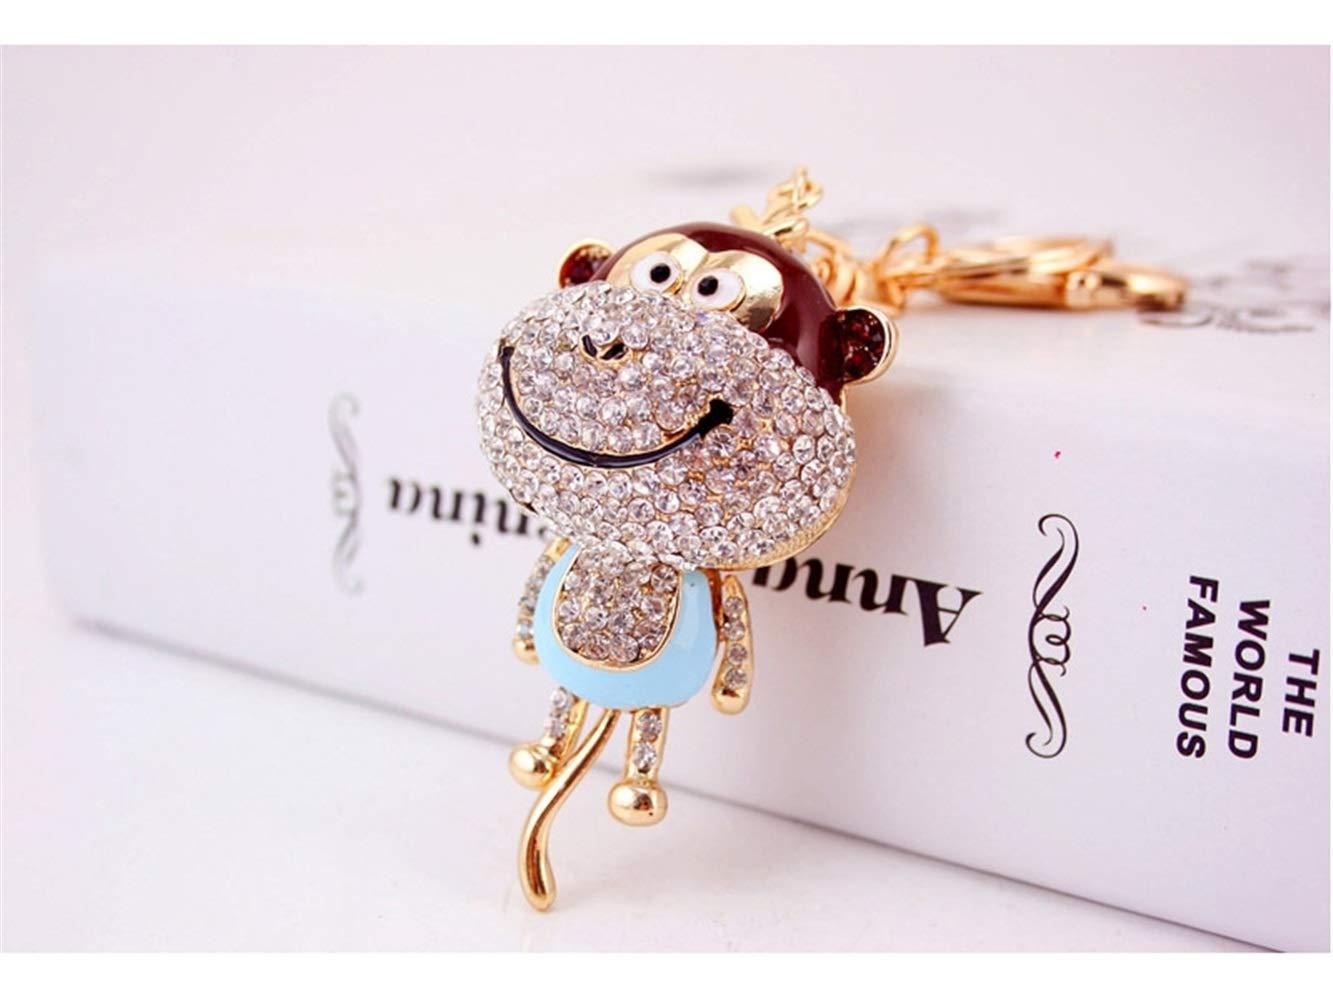 Car Keychain, Cute Diamond Long Tail Monkey Keychain Animal Shape Key Trinket Car Bag Key Holder Decorations(Blue) for Gift